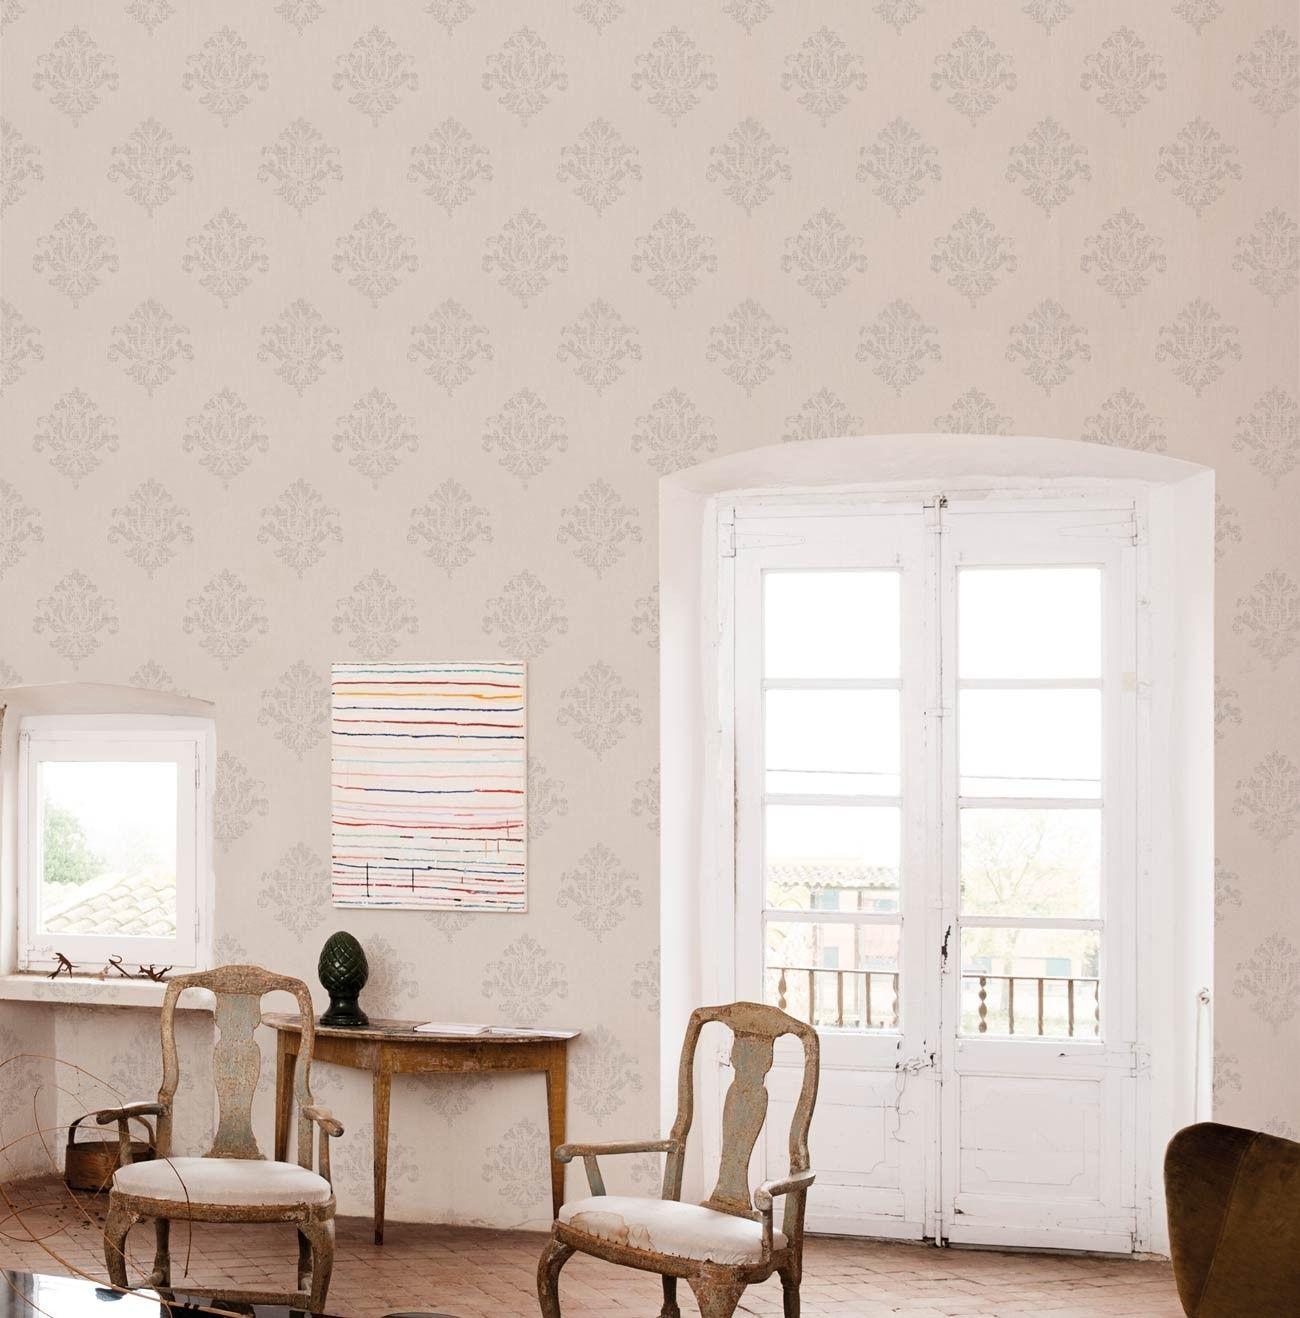 Coordonne Ceylan Wallpaper - Yala Wallpaper | 4400020 | £48.00 ...